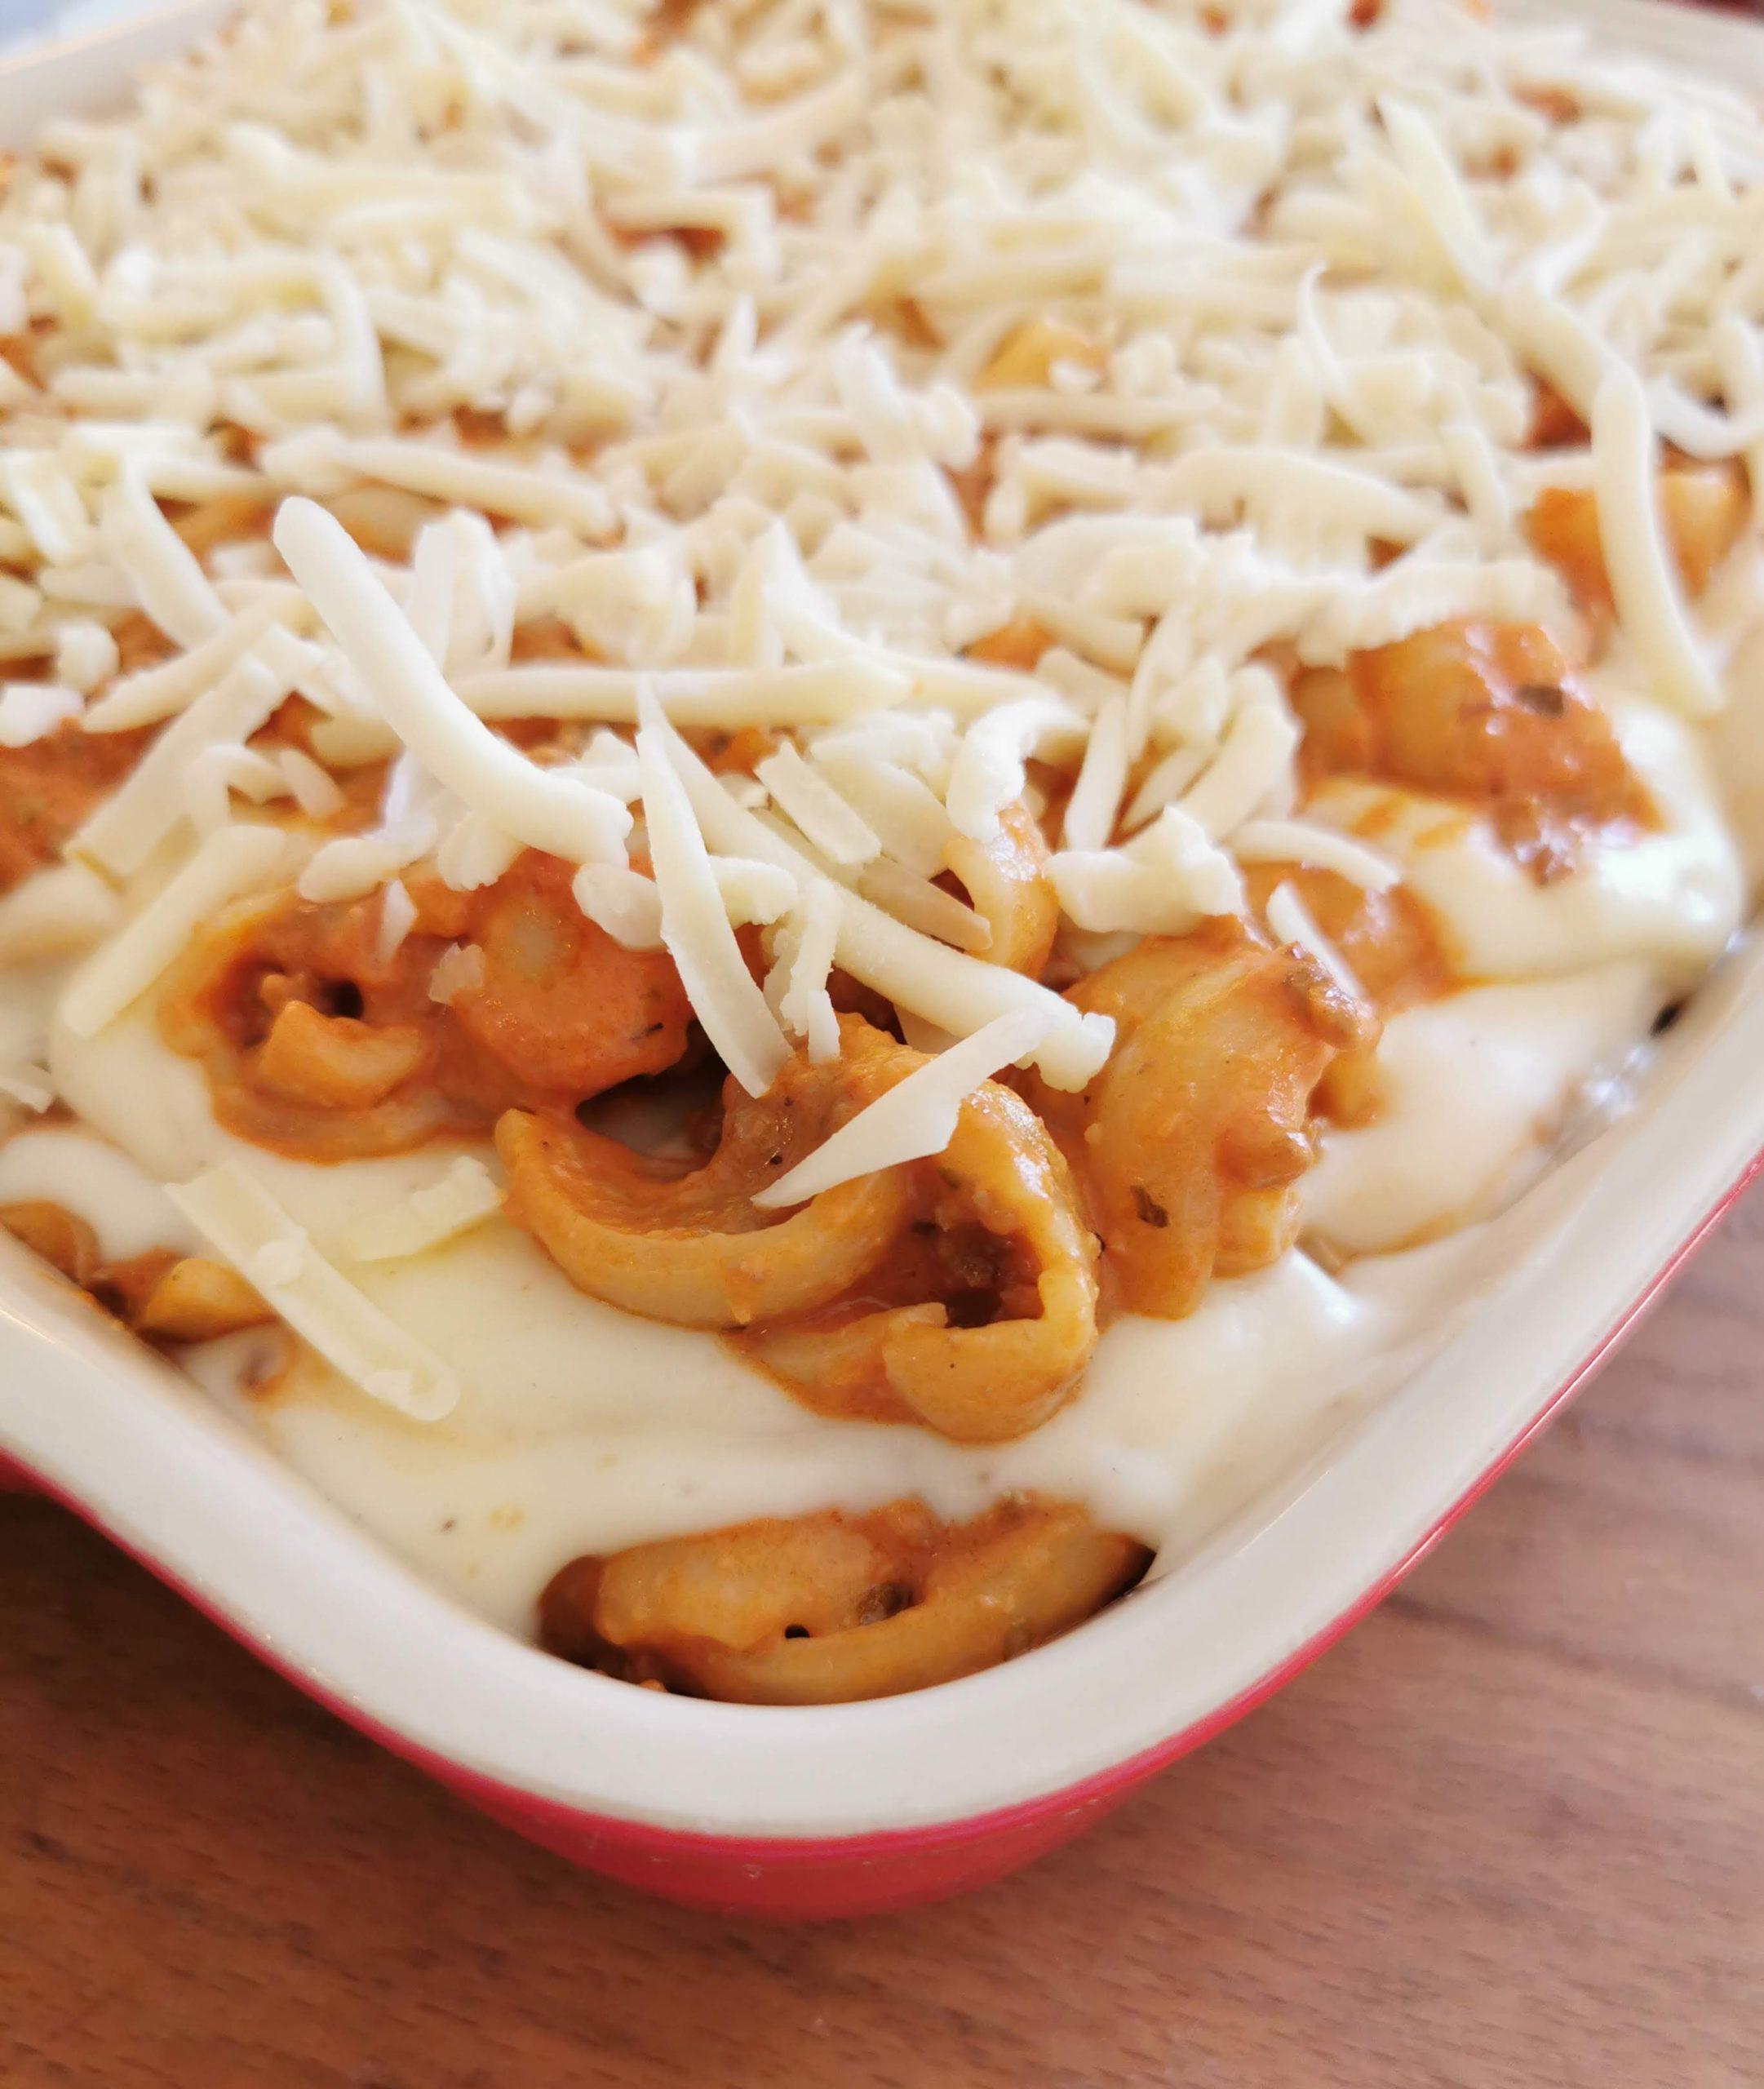 Helens recept på lasagne